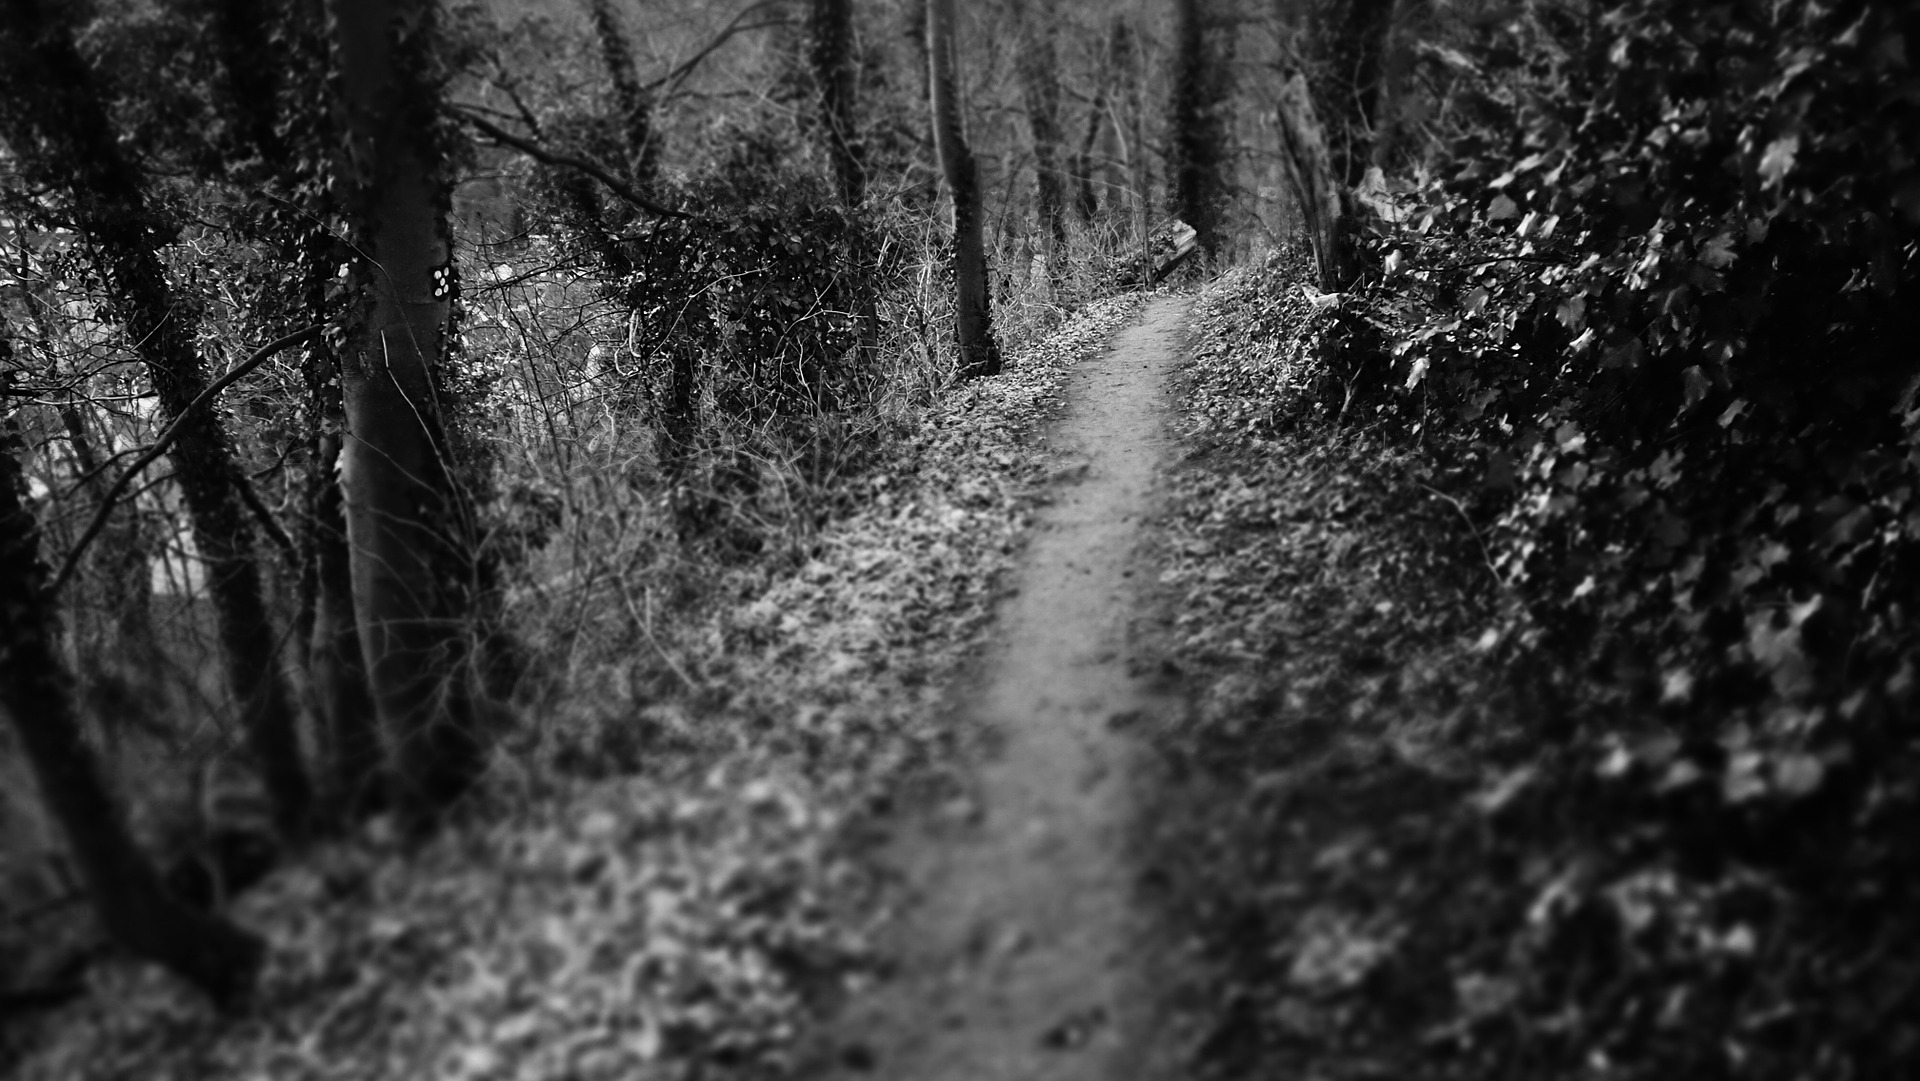 dark-path-1303697_1920